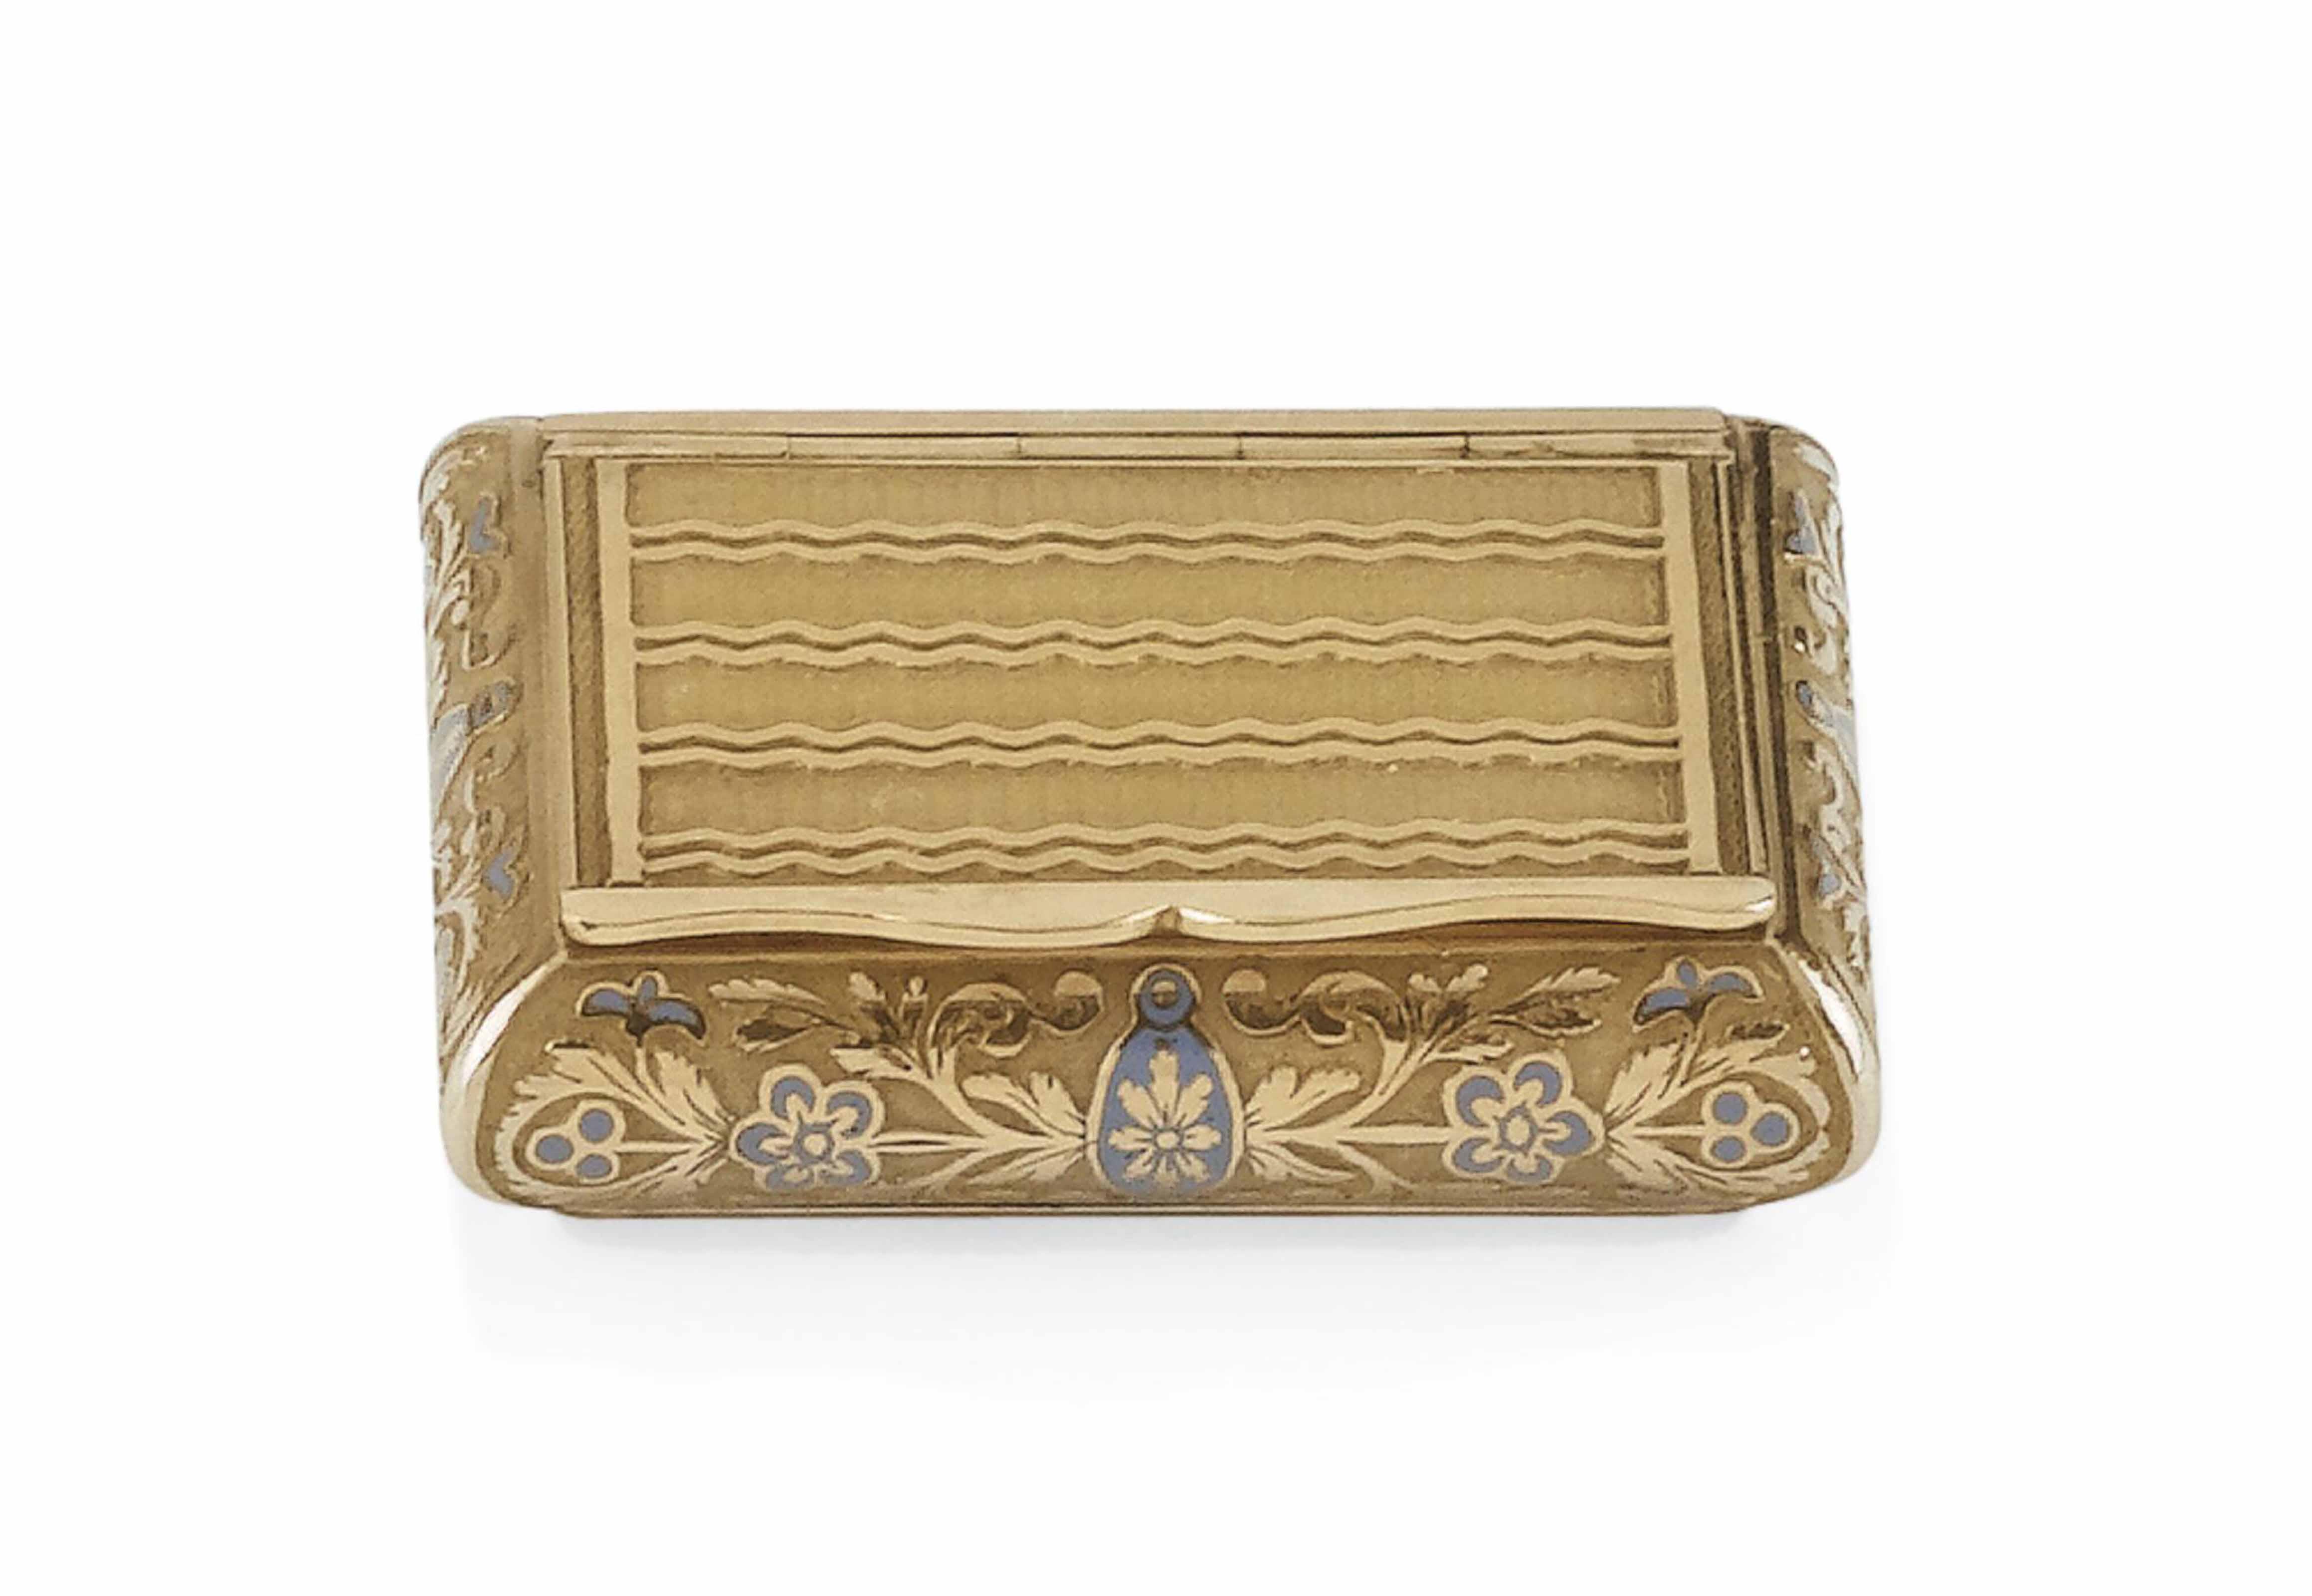 A SWISS ENAMELLED GOLD VINAIGR